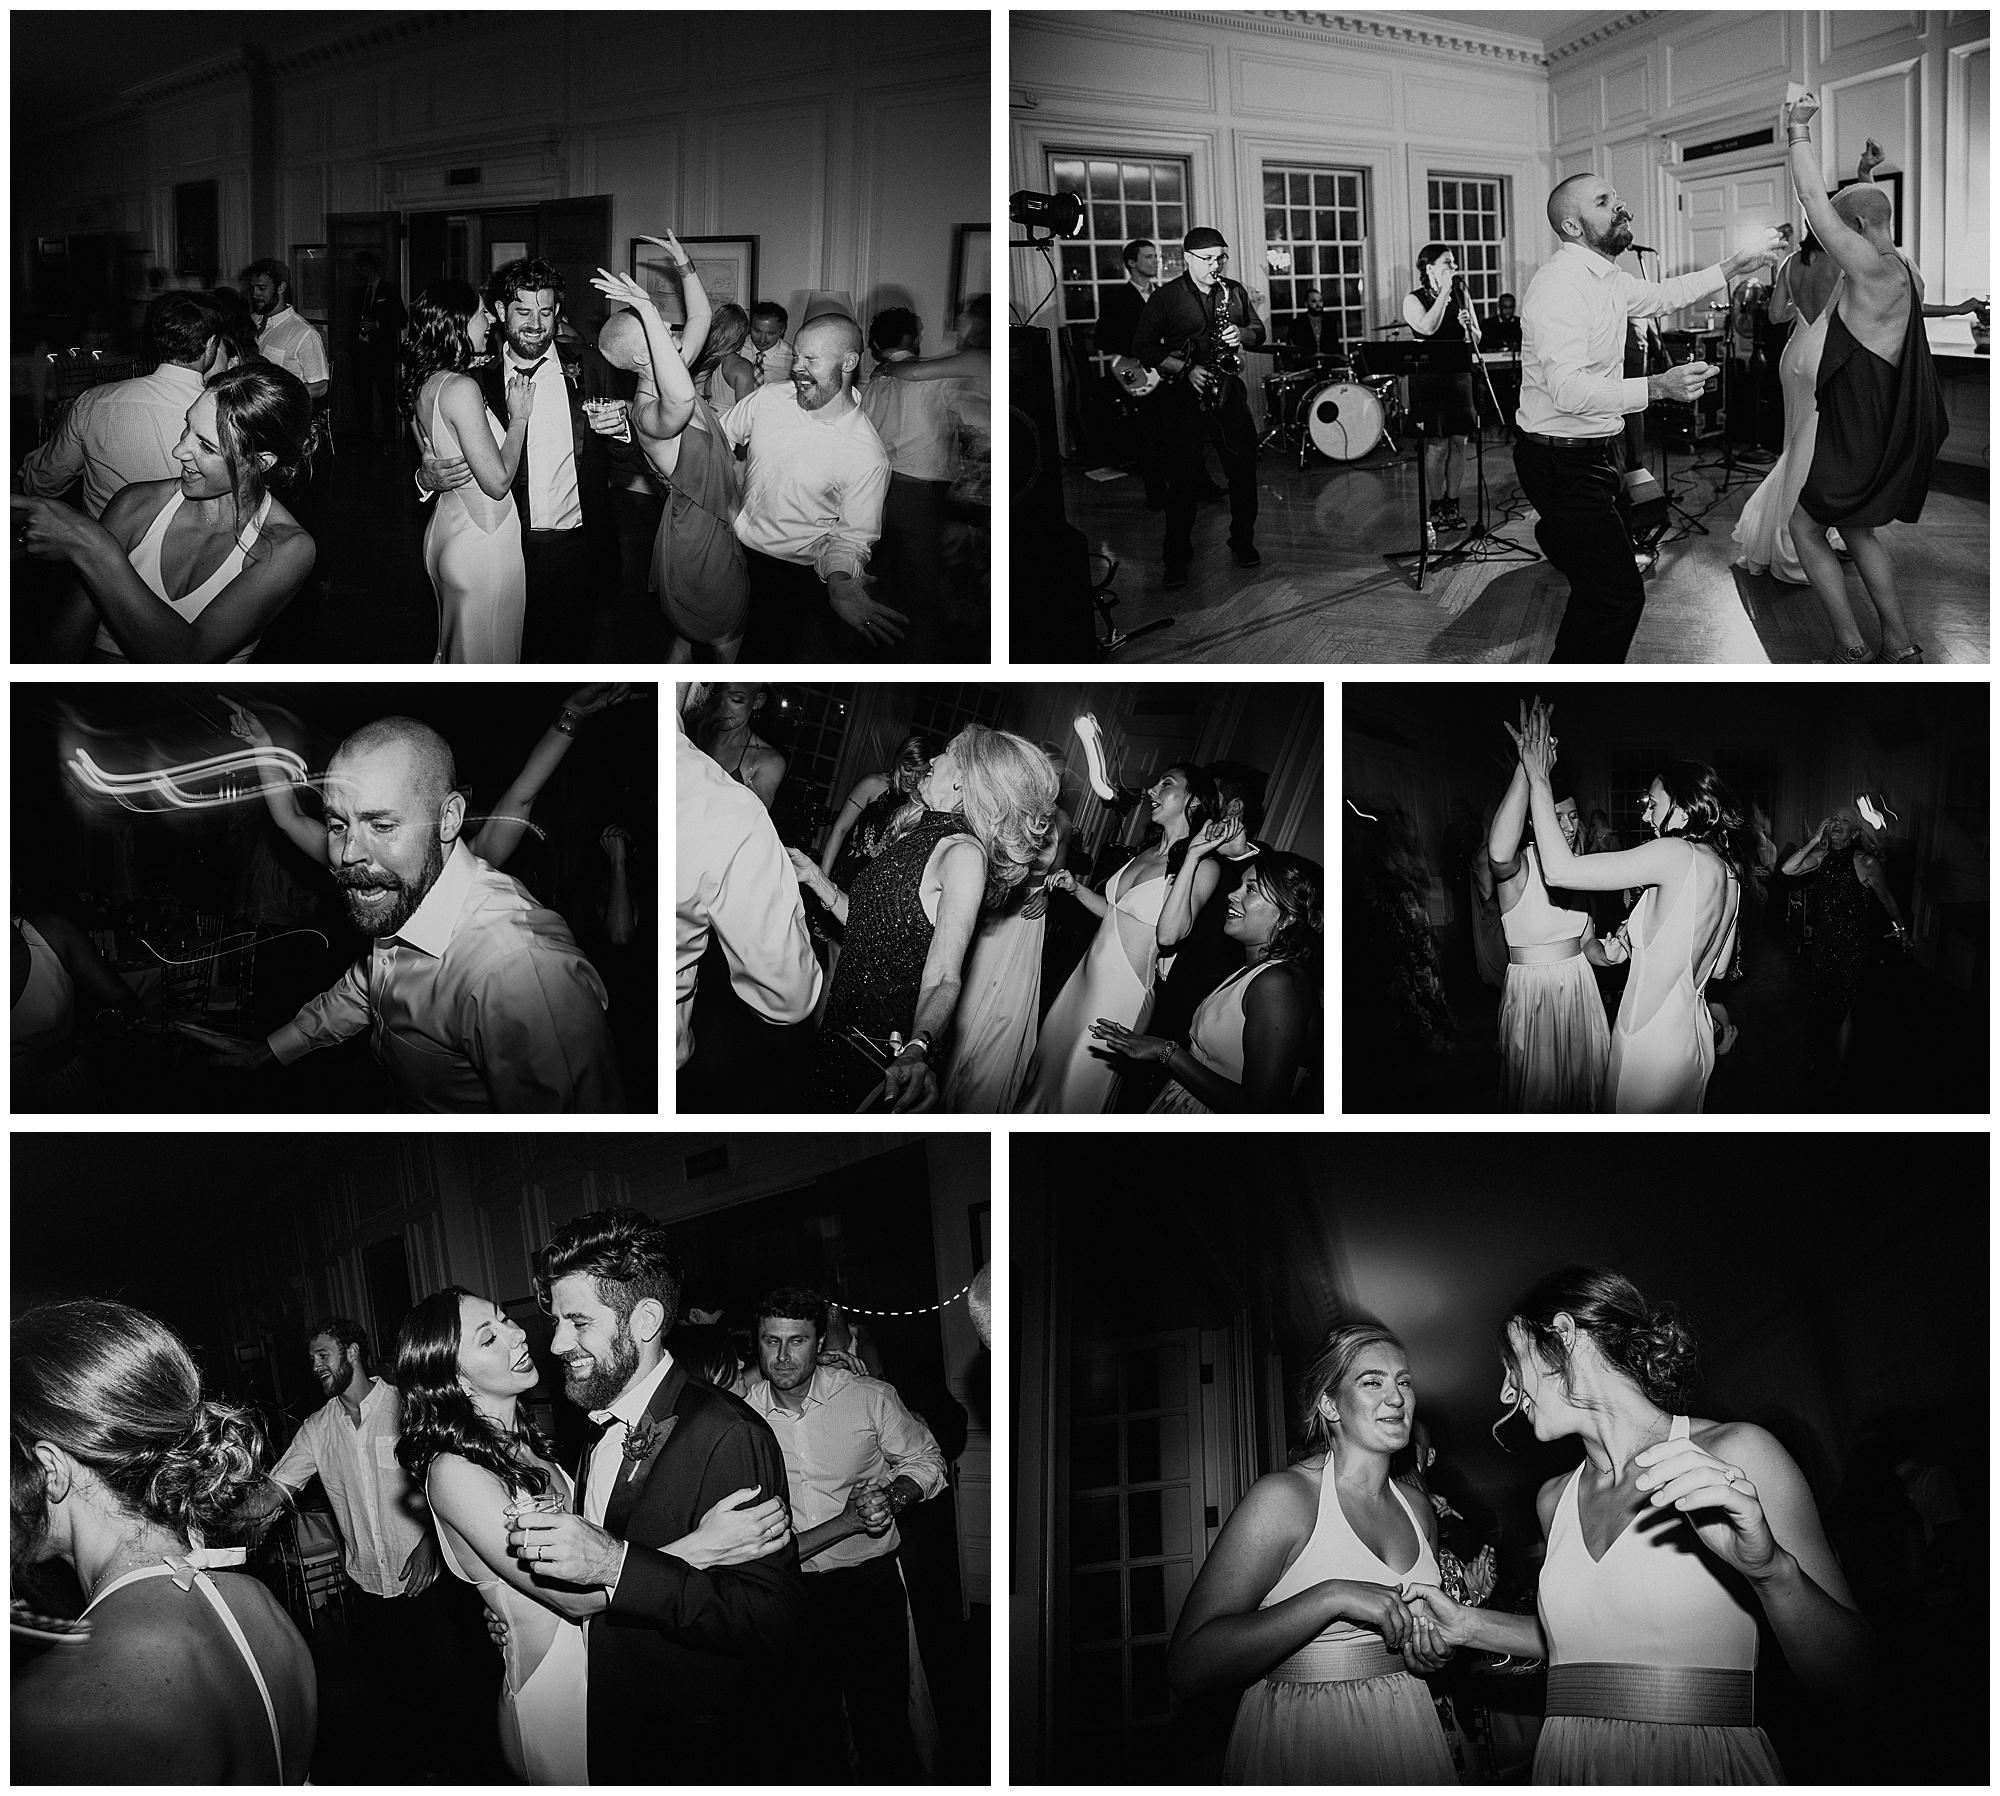 allerton_park_wedding_champaign_il_chicago_wright_photographs_ne_0038.jpg